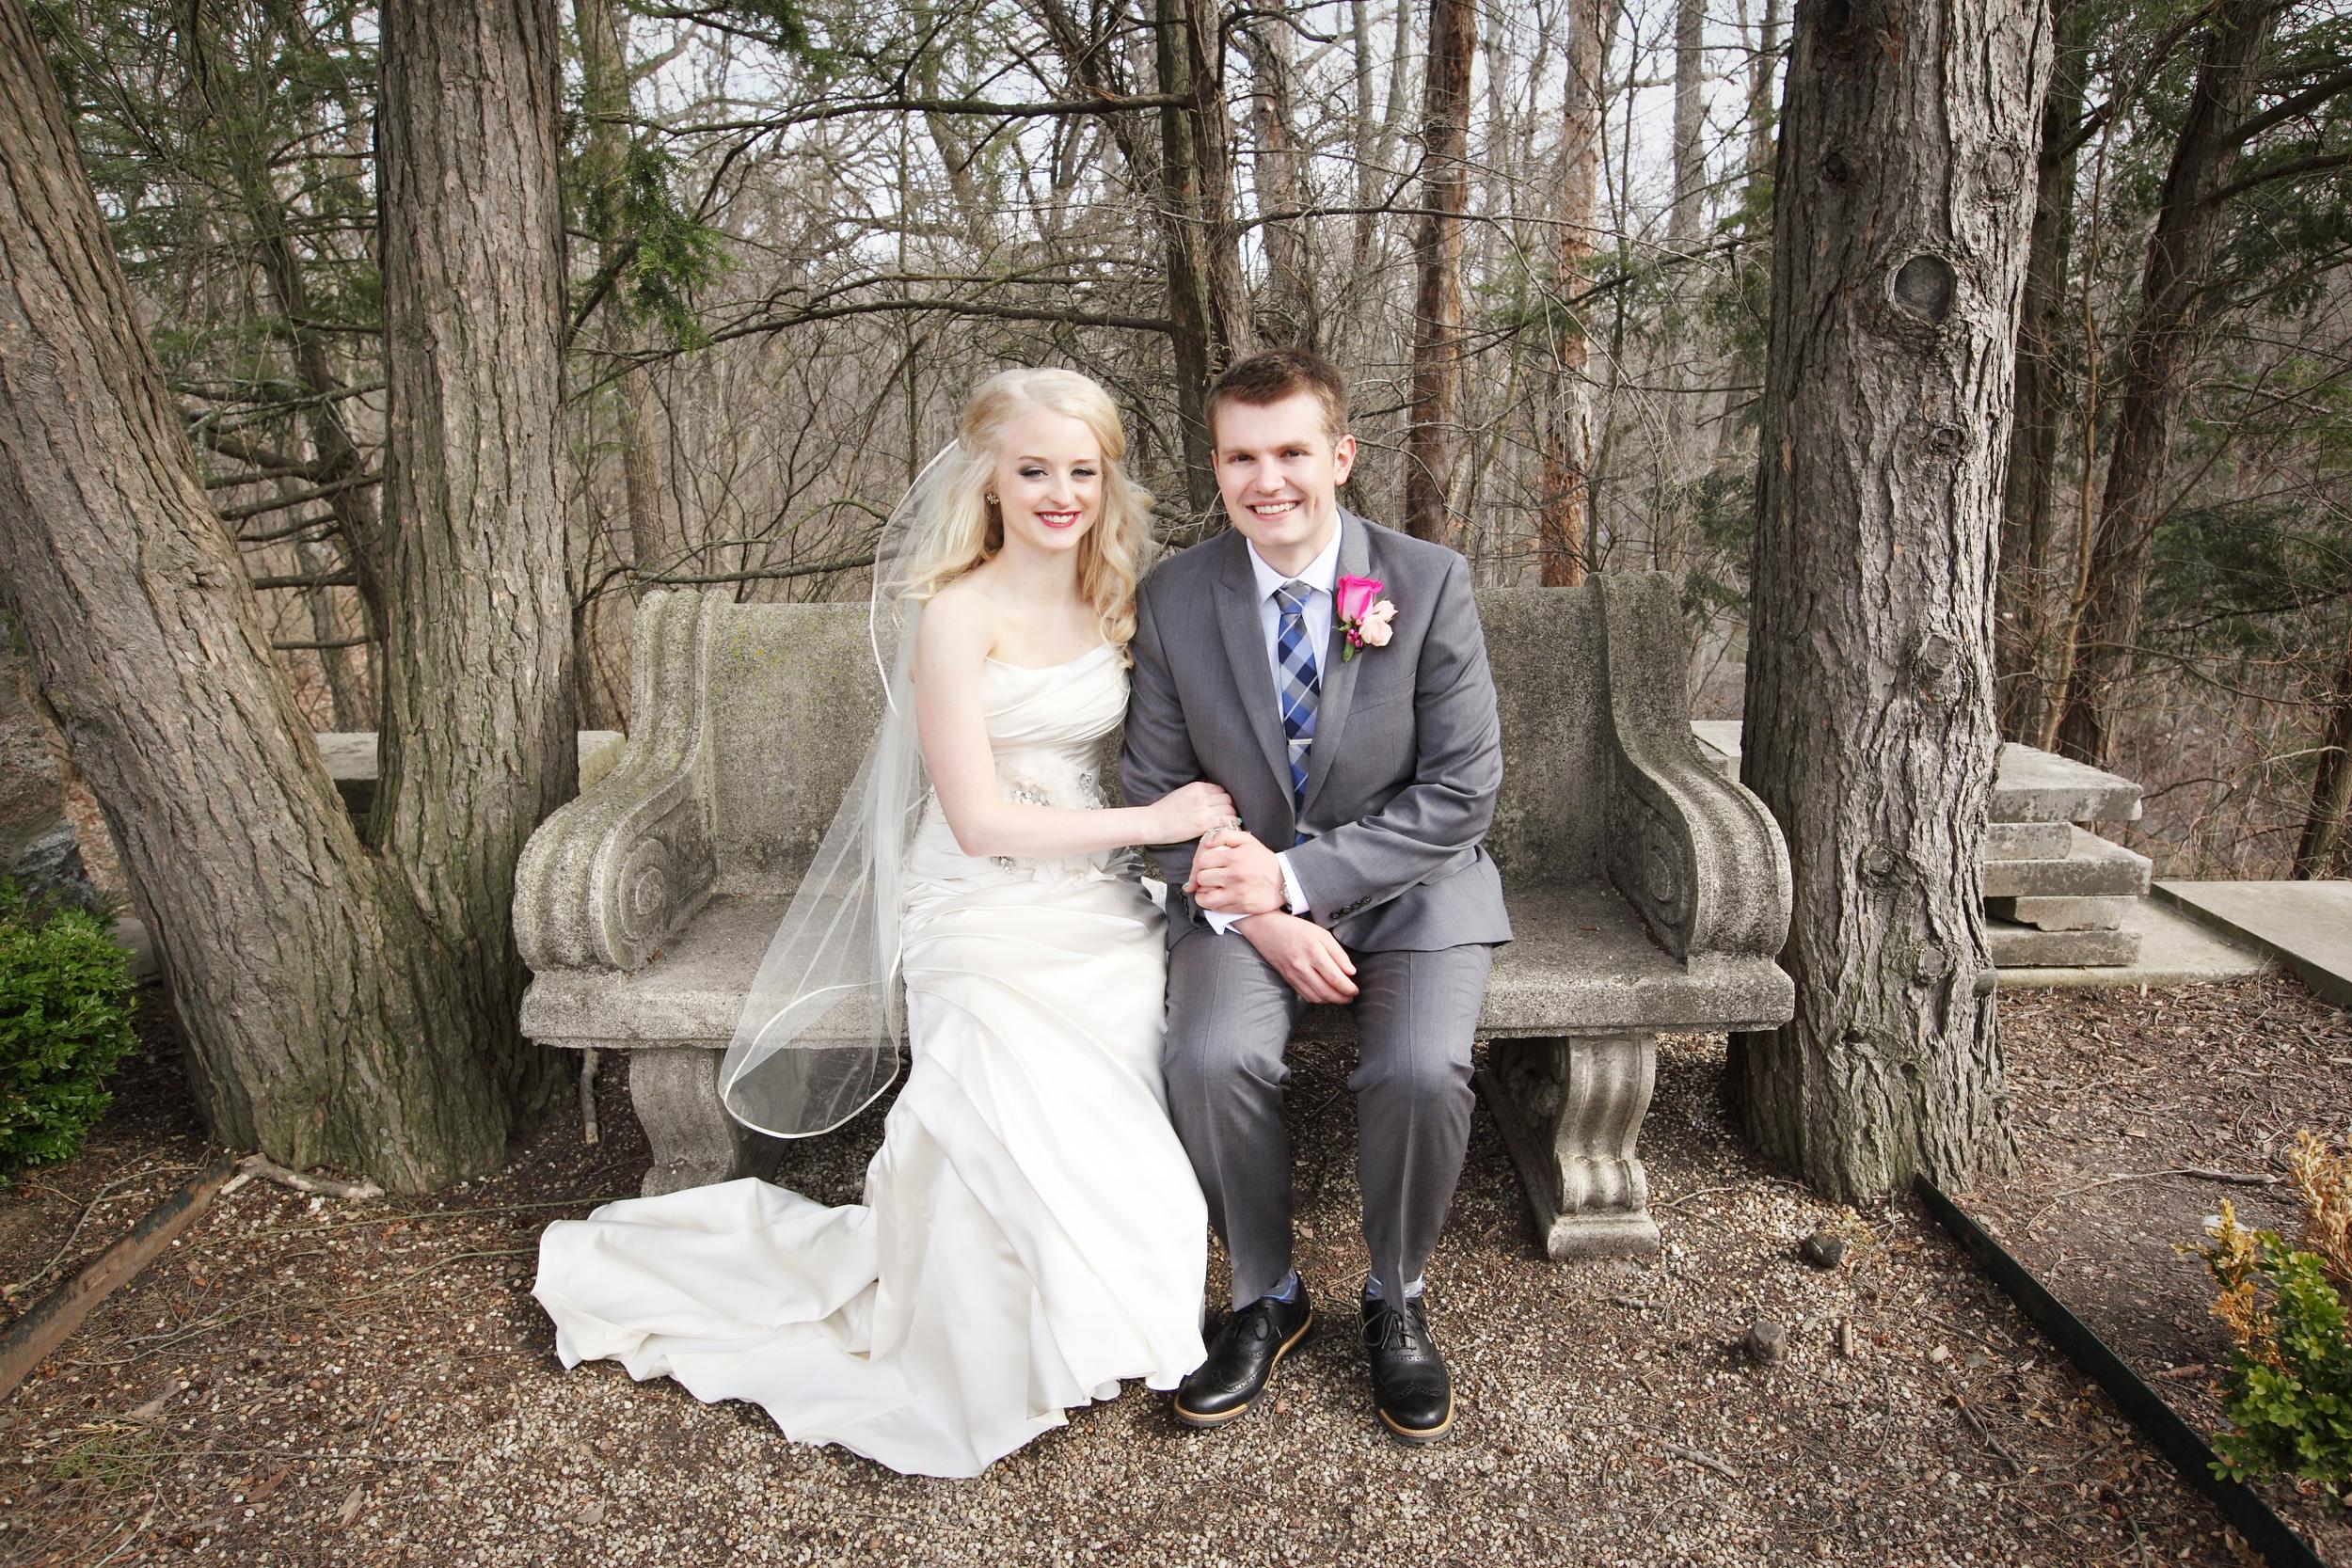 00_Fox_and_Hound_Photo_Wedding_Photography_4/12/14